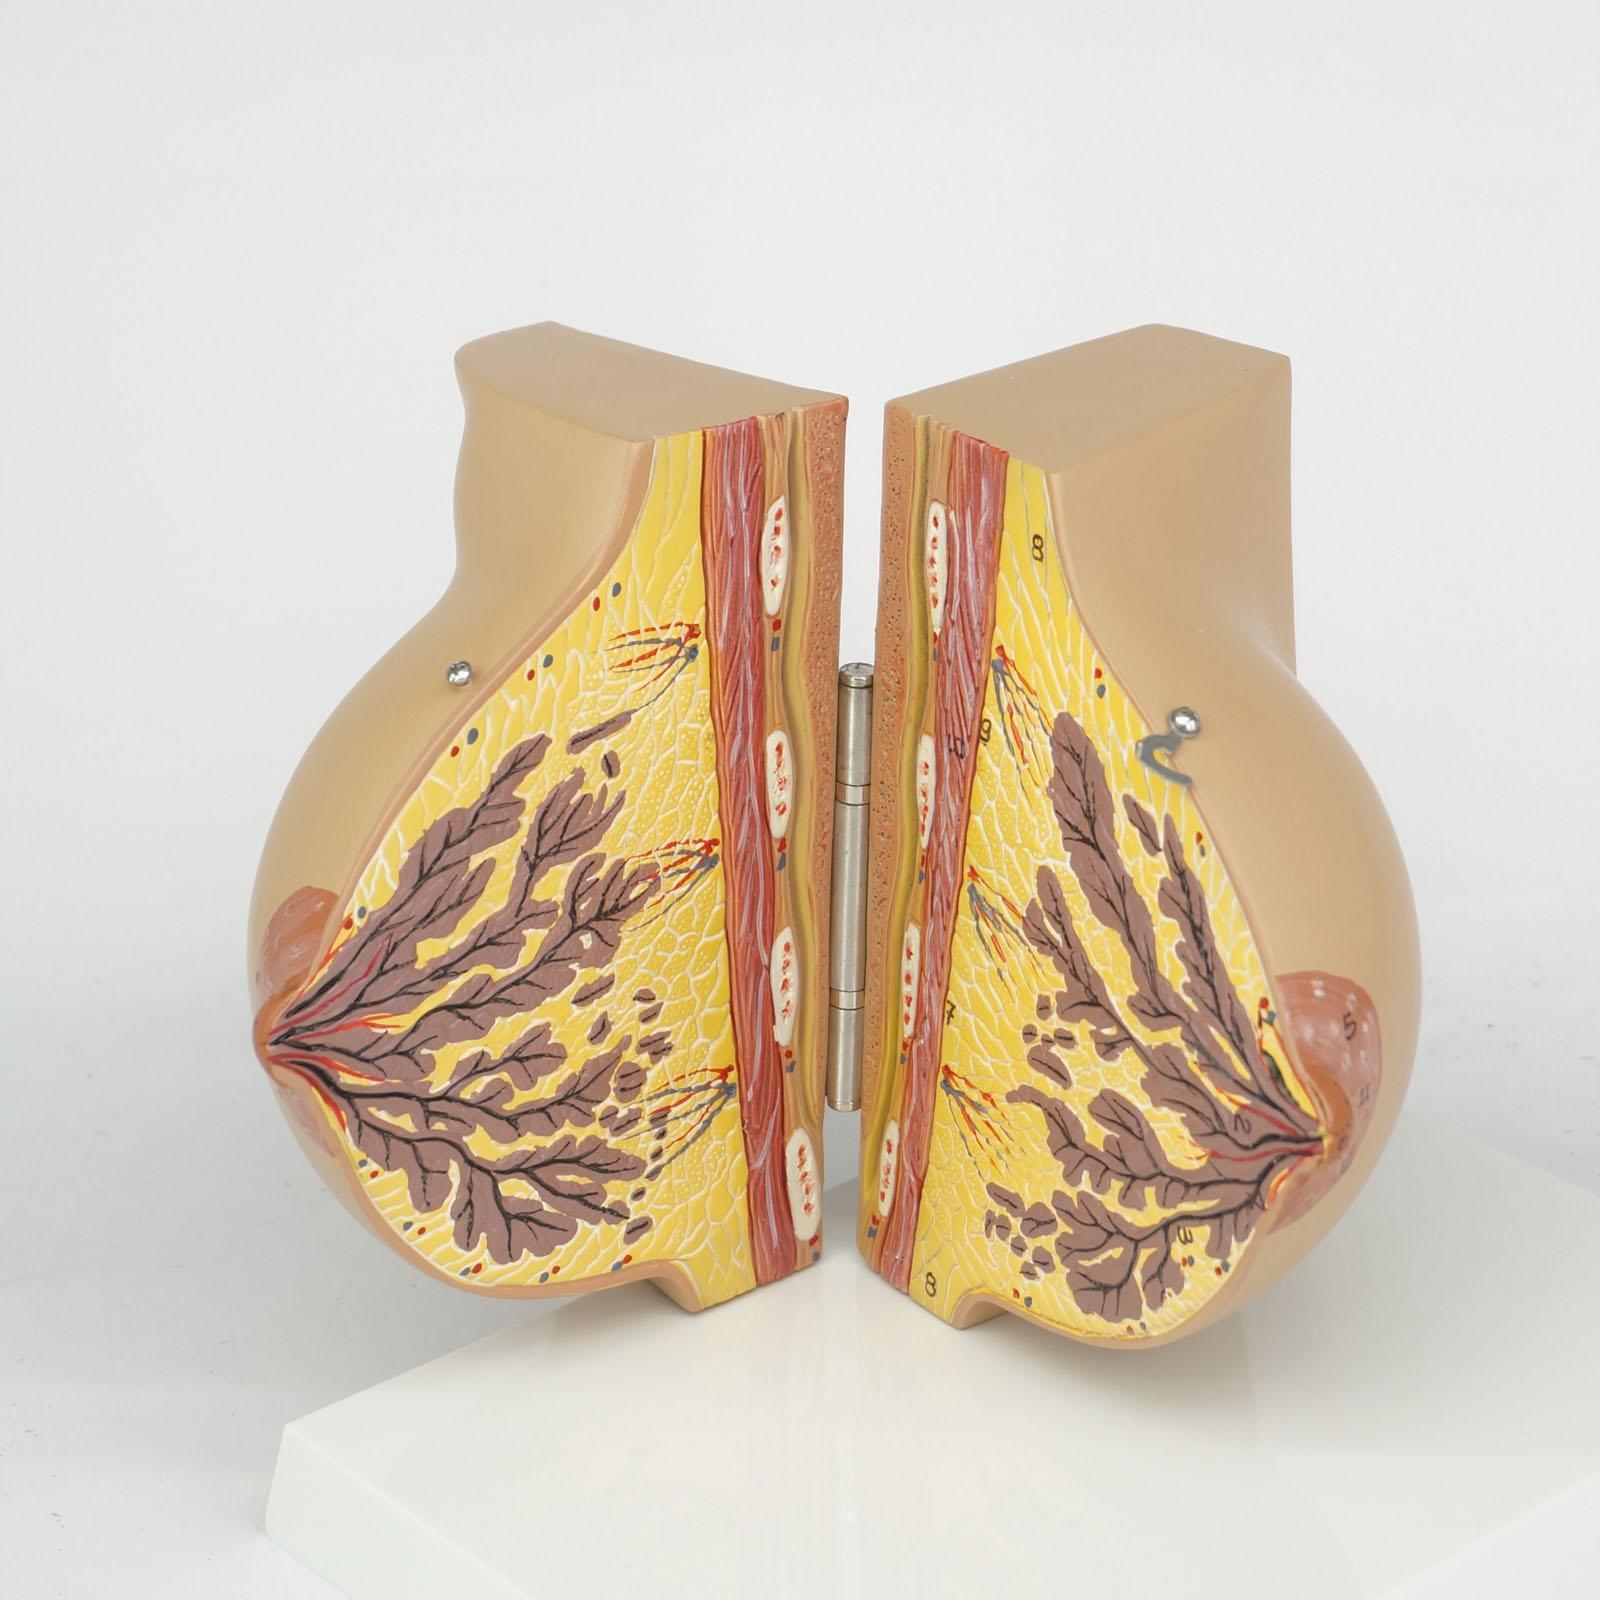 Medizinische Feminine Stationäre Phase Brust Modell Anatomie ...